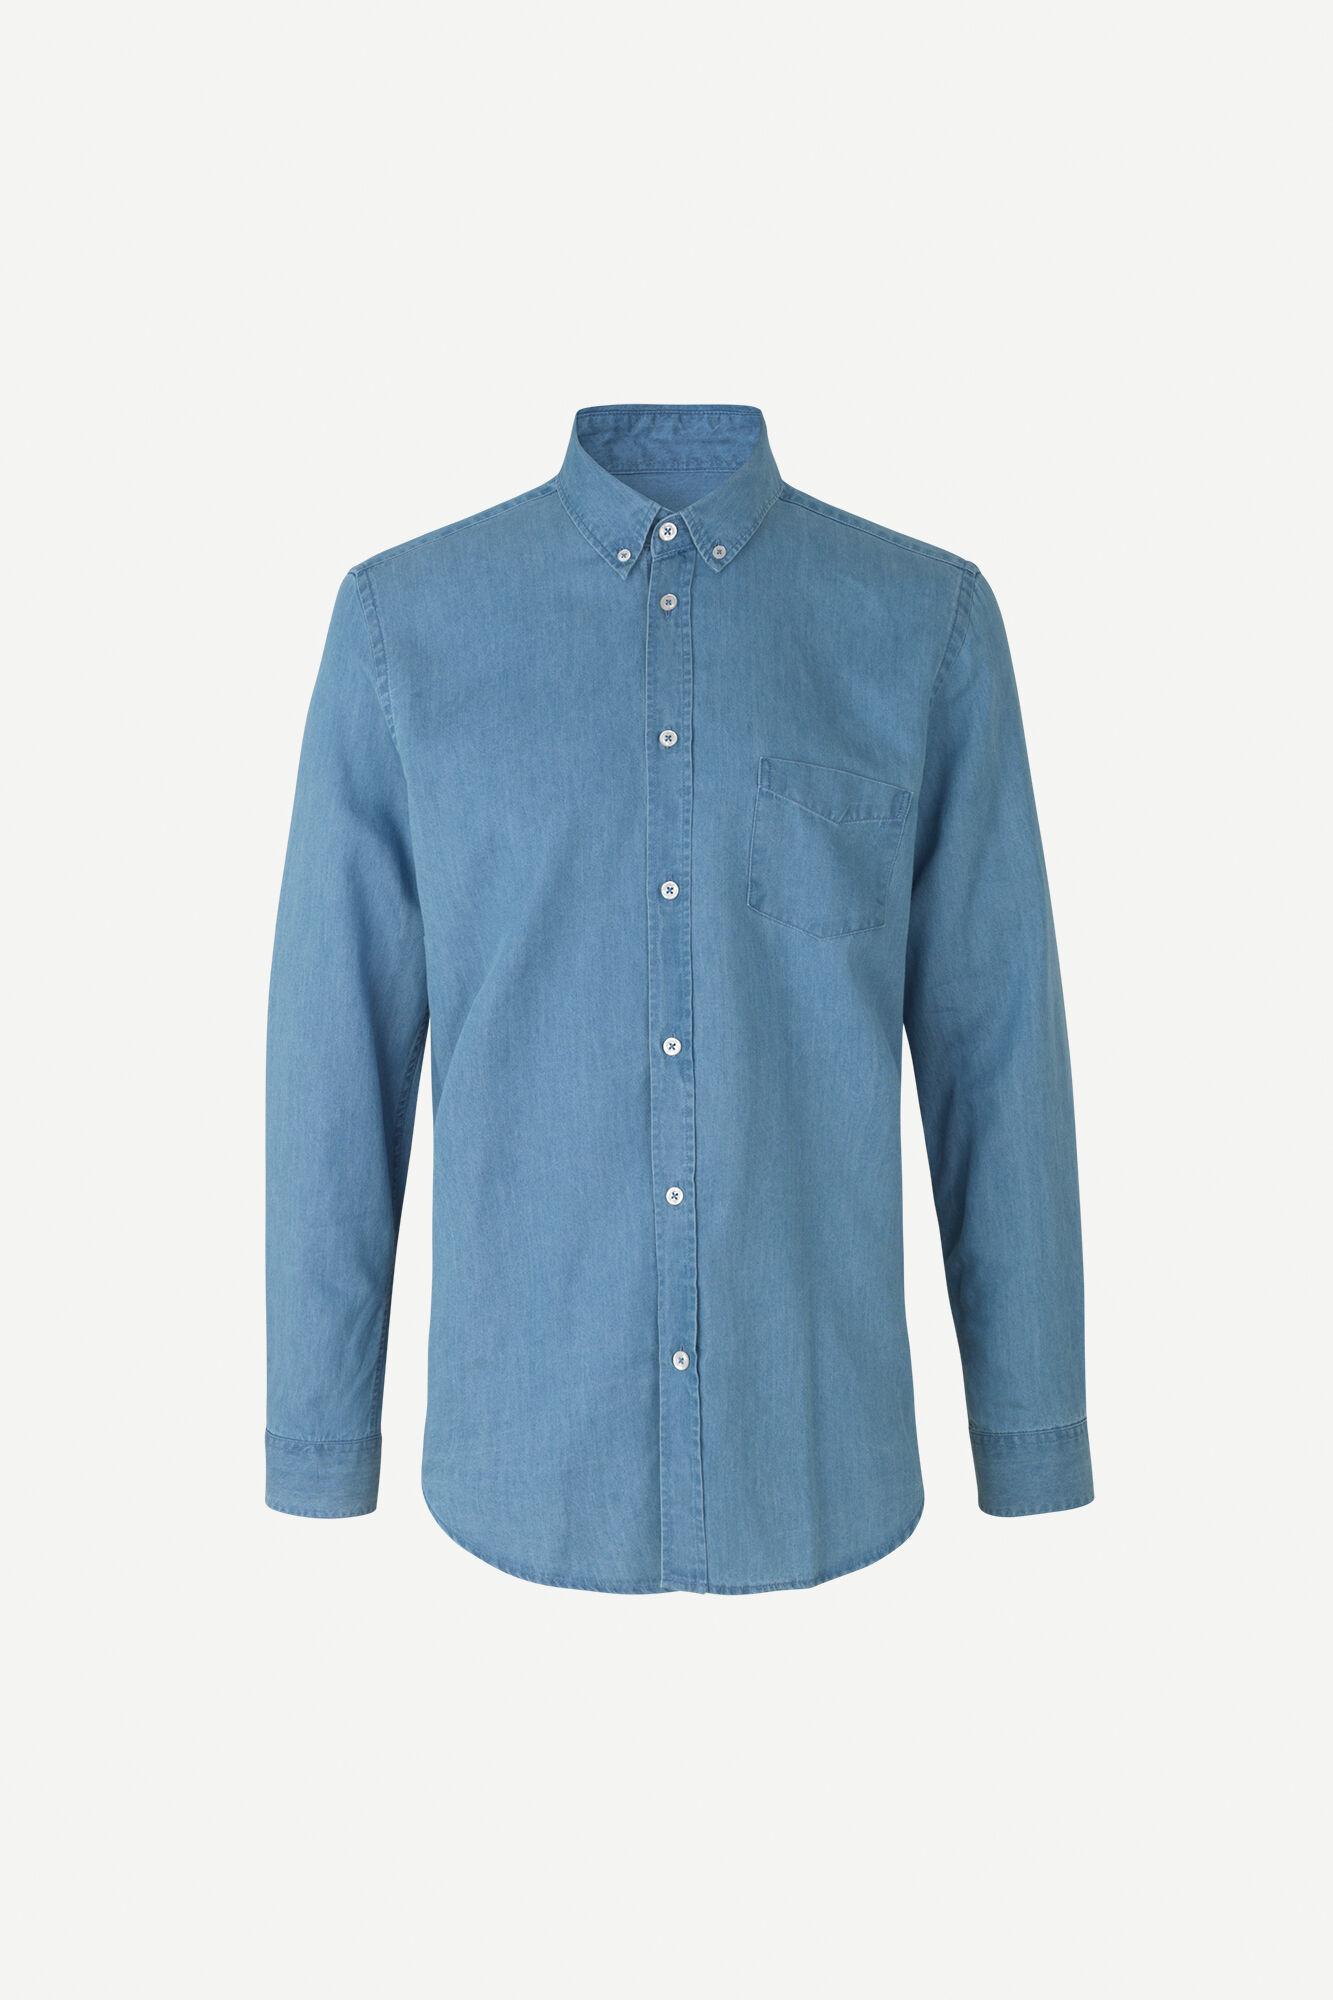 Liam BA Dream Blue Jeans Shirt-1